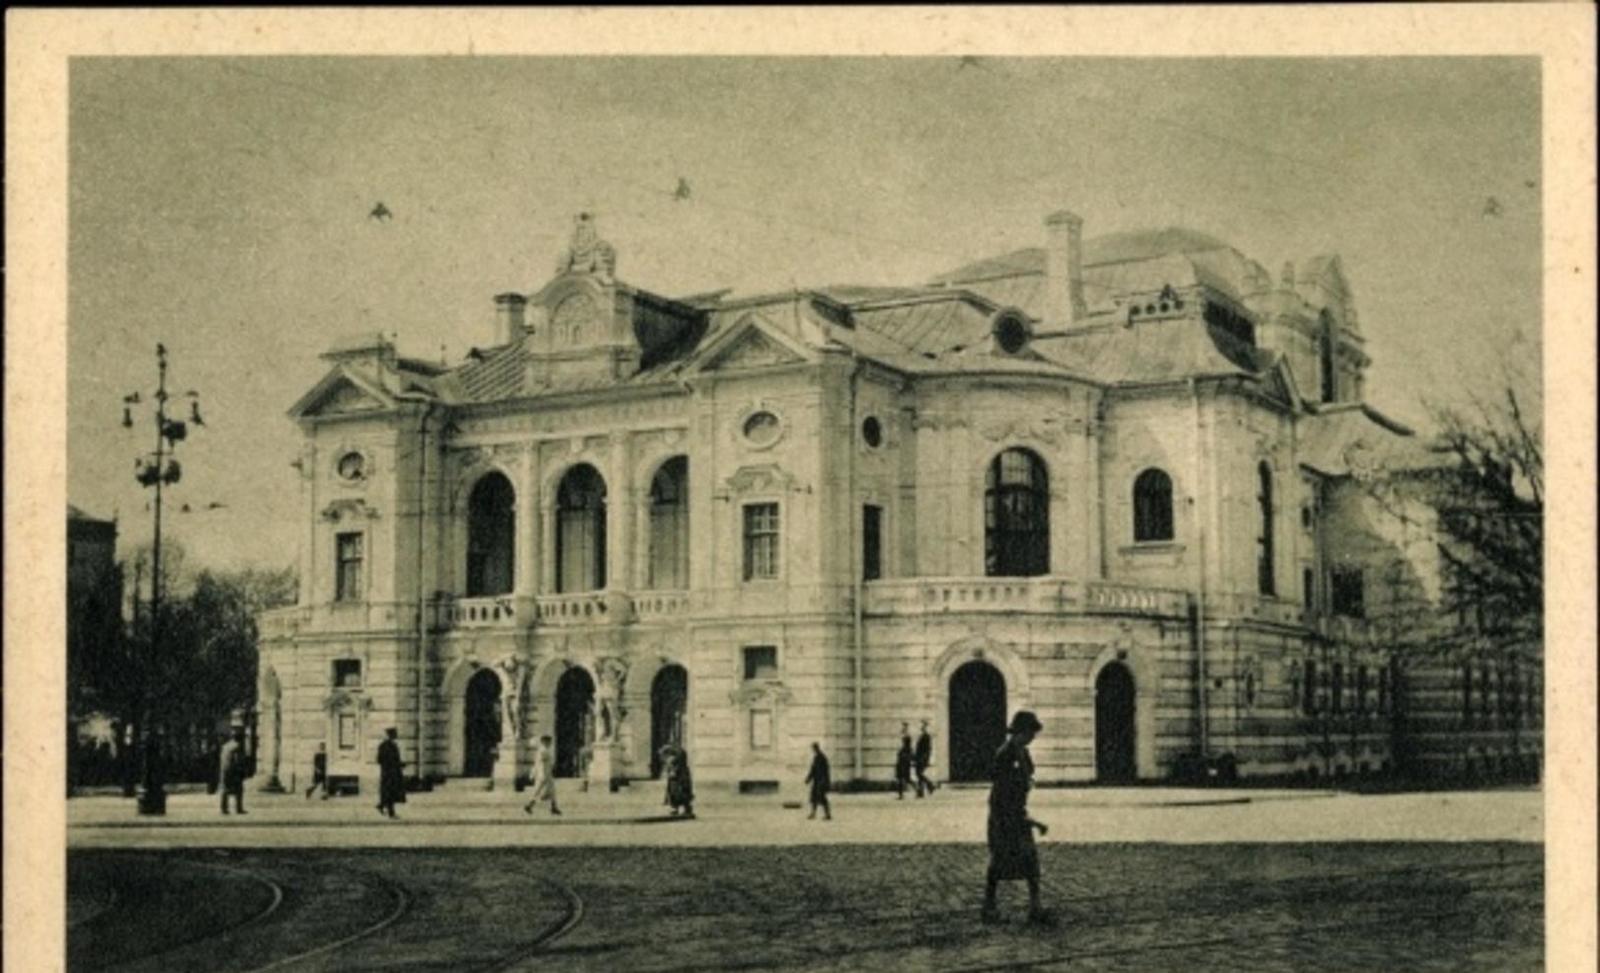 Riga -  Cp Riga Lettland, Theaterhaus, Straßenansicht